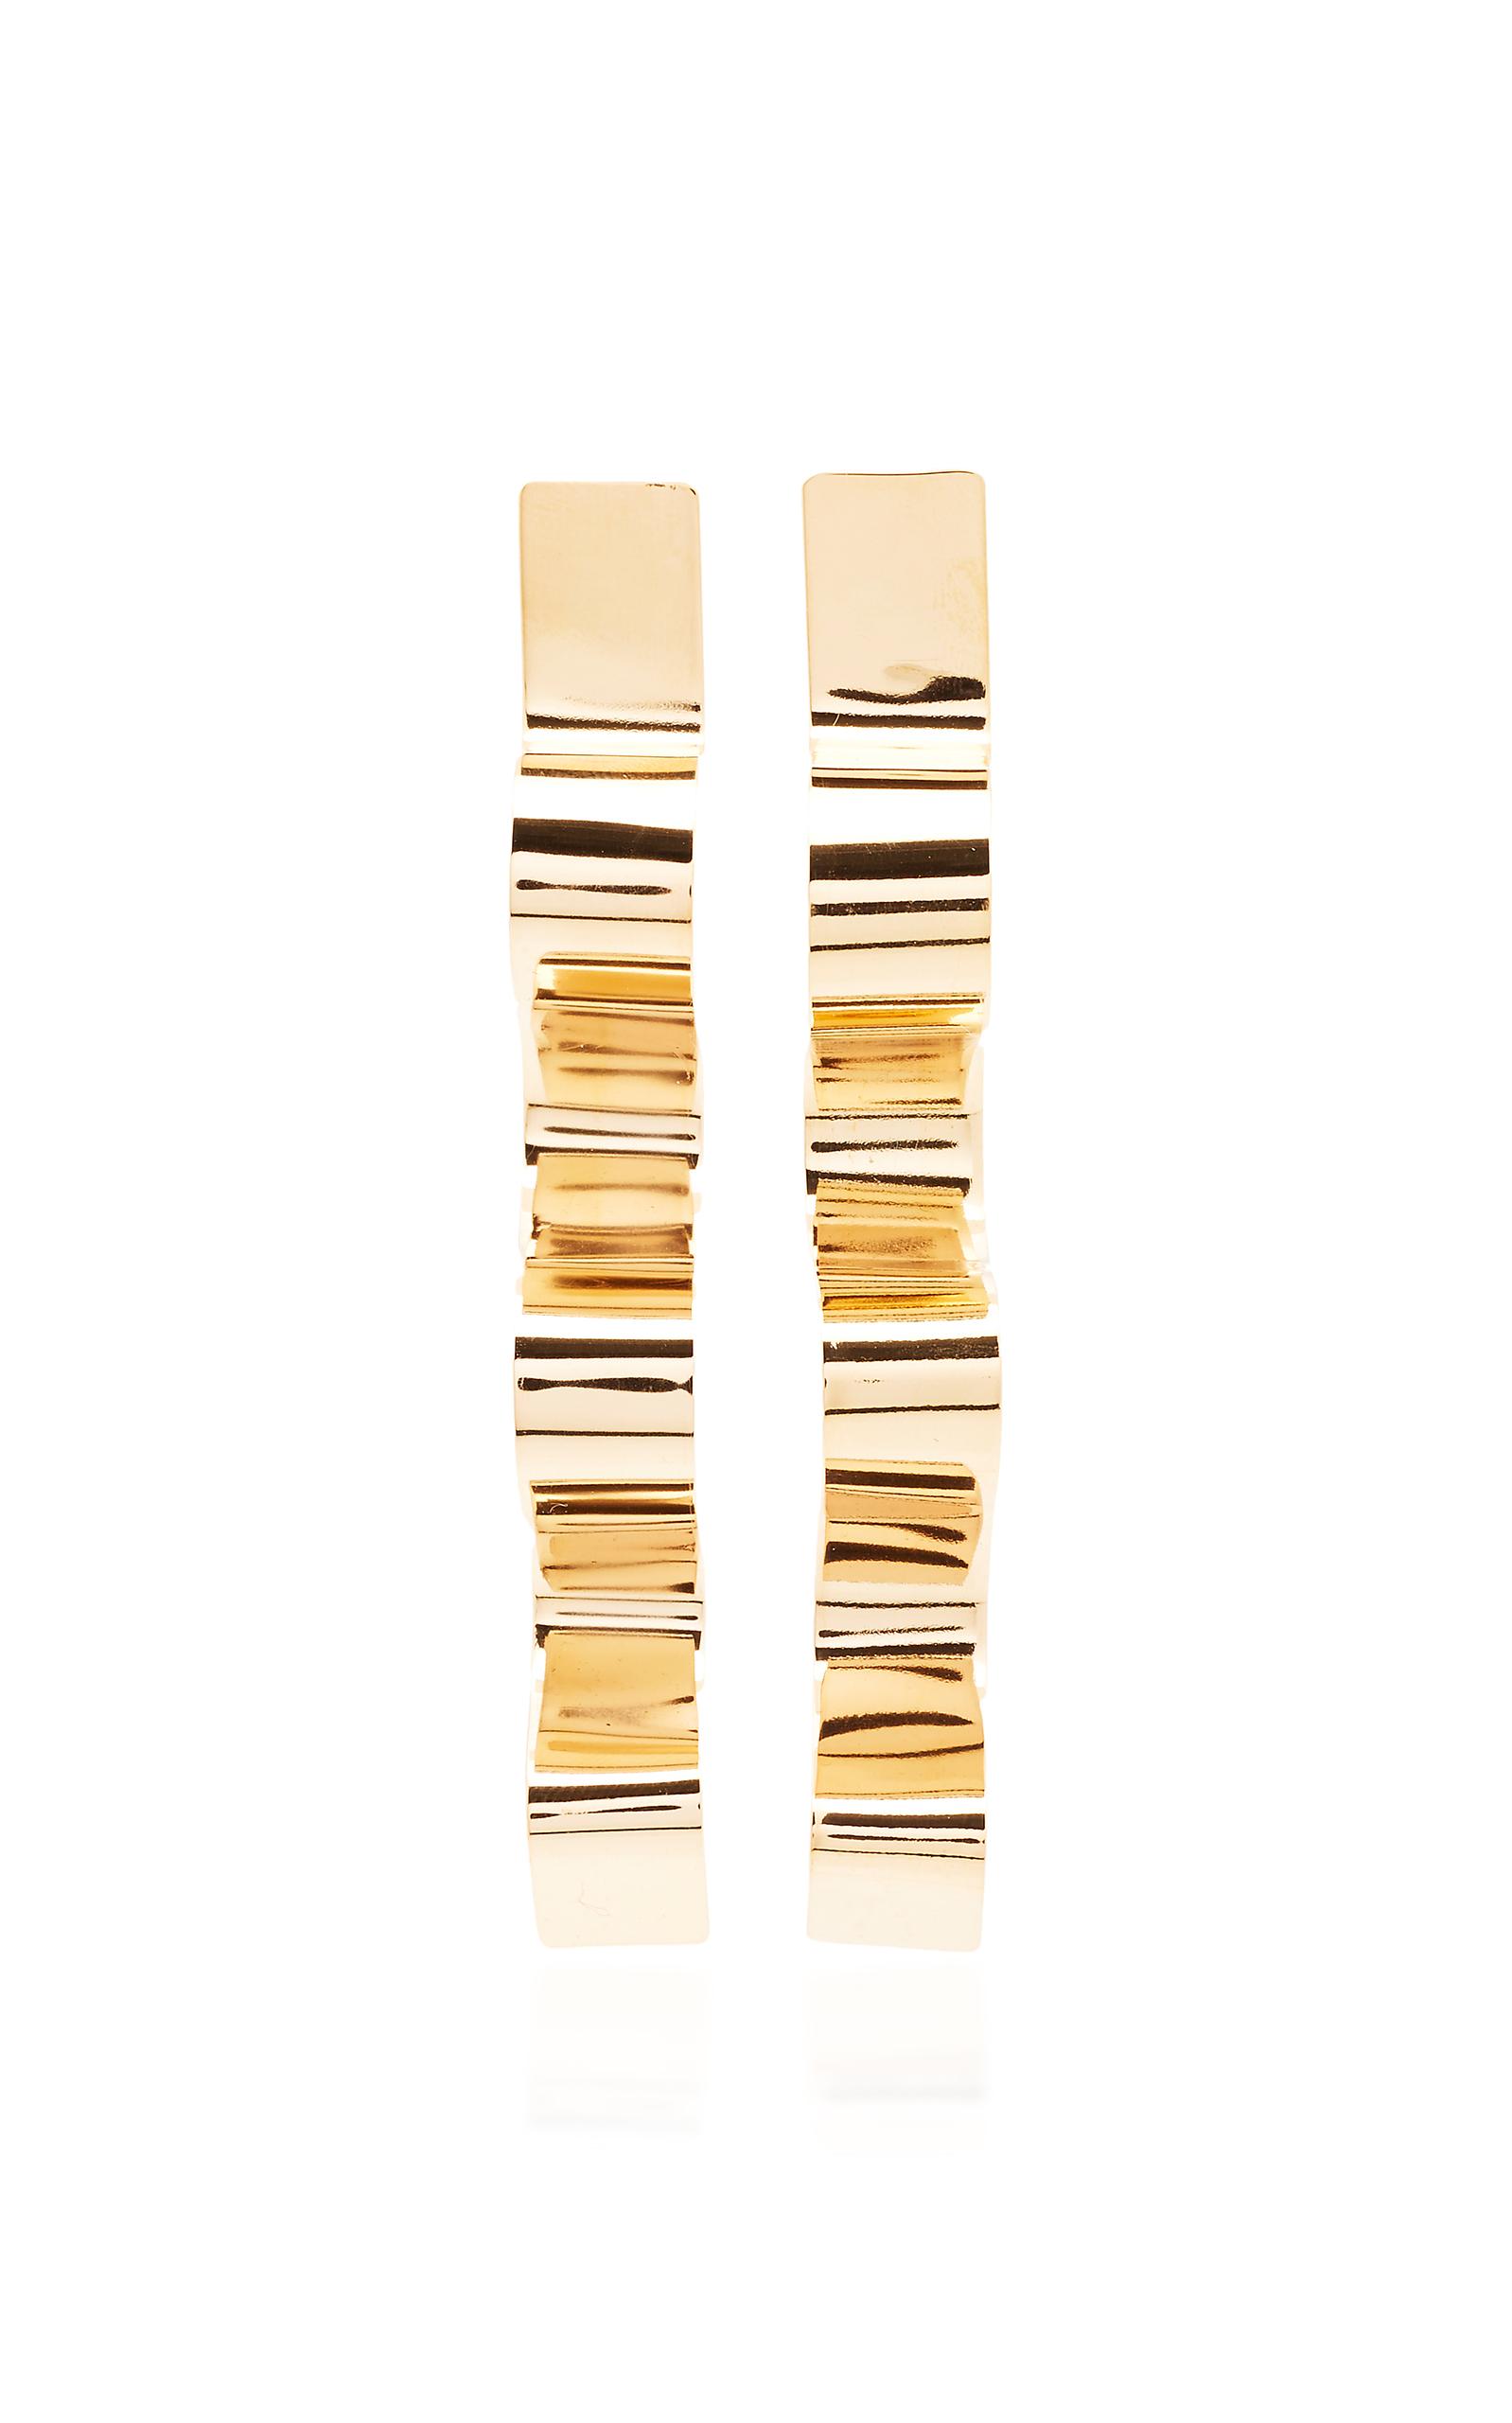 BIA DAIDONE SOFIA 24K GOLD-PLATED EARRINGS